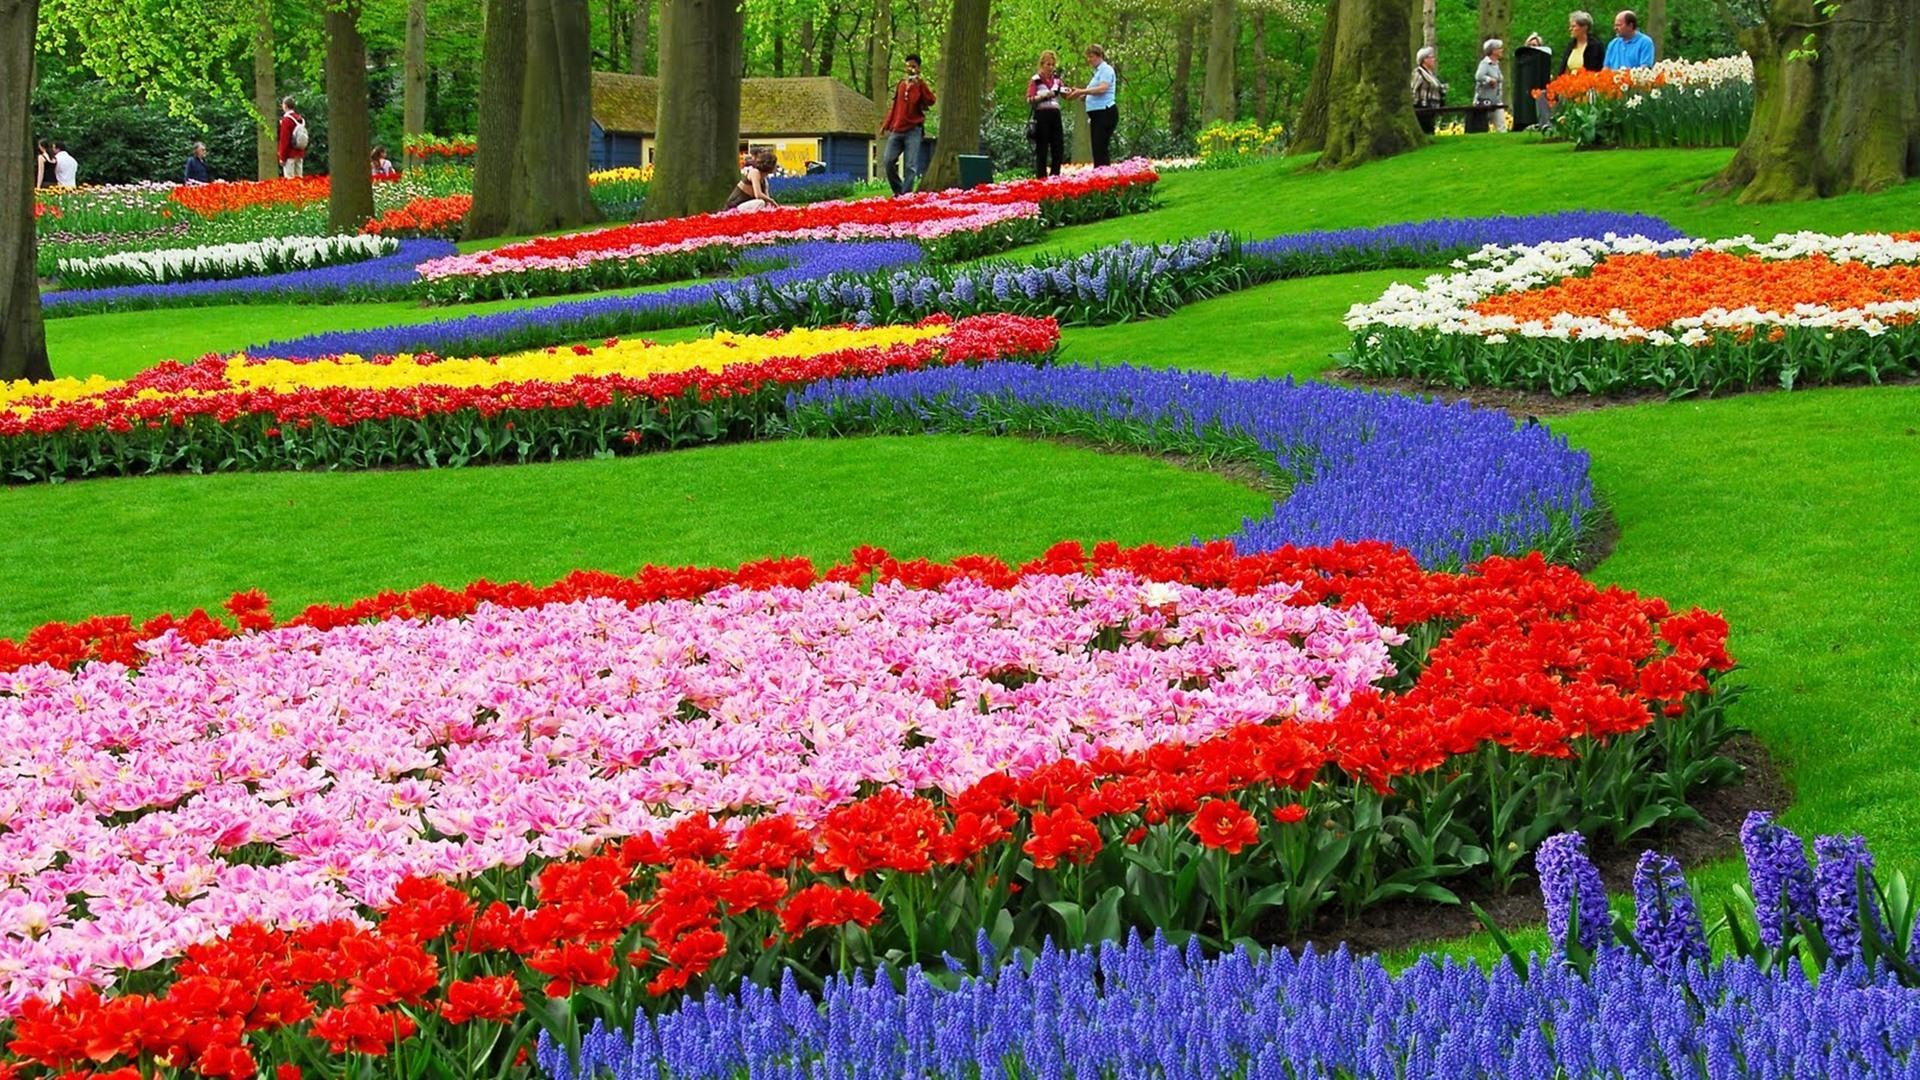 Res: 1920x1080, beautiful garden wallpaper free download #1402446